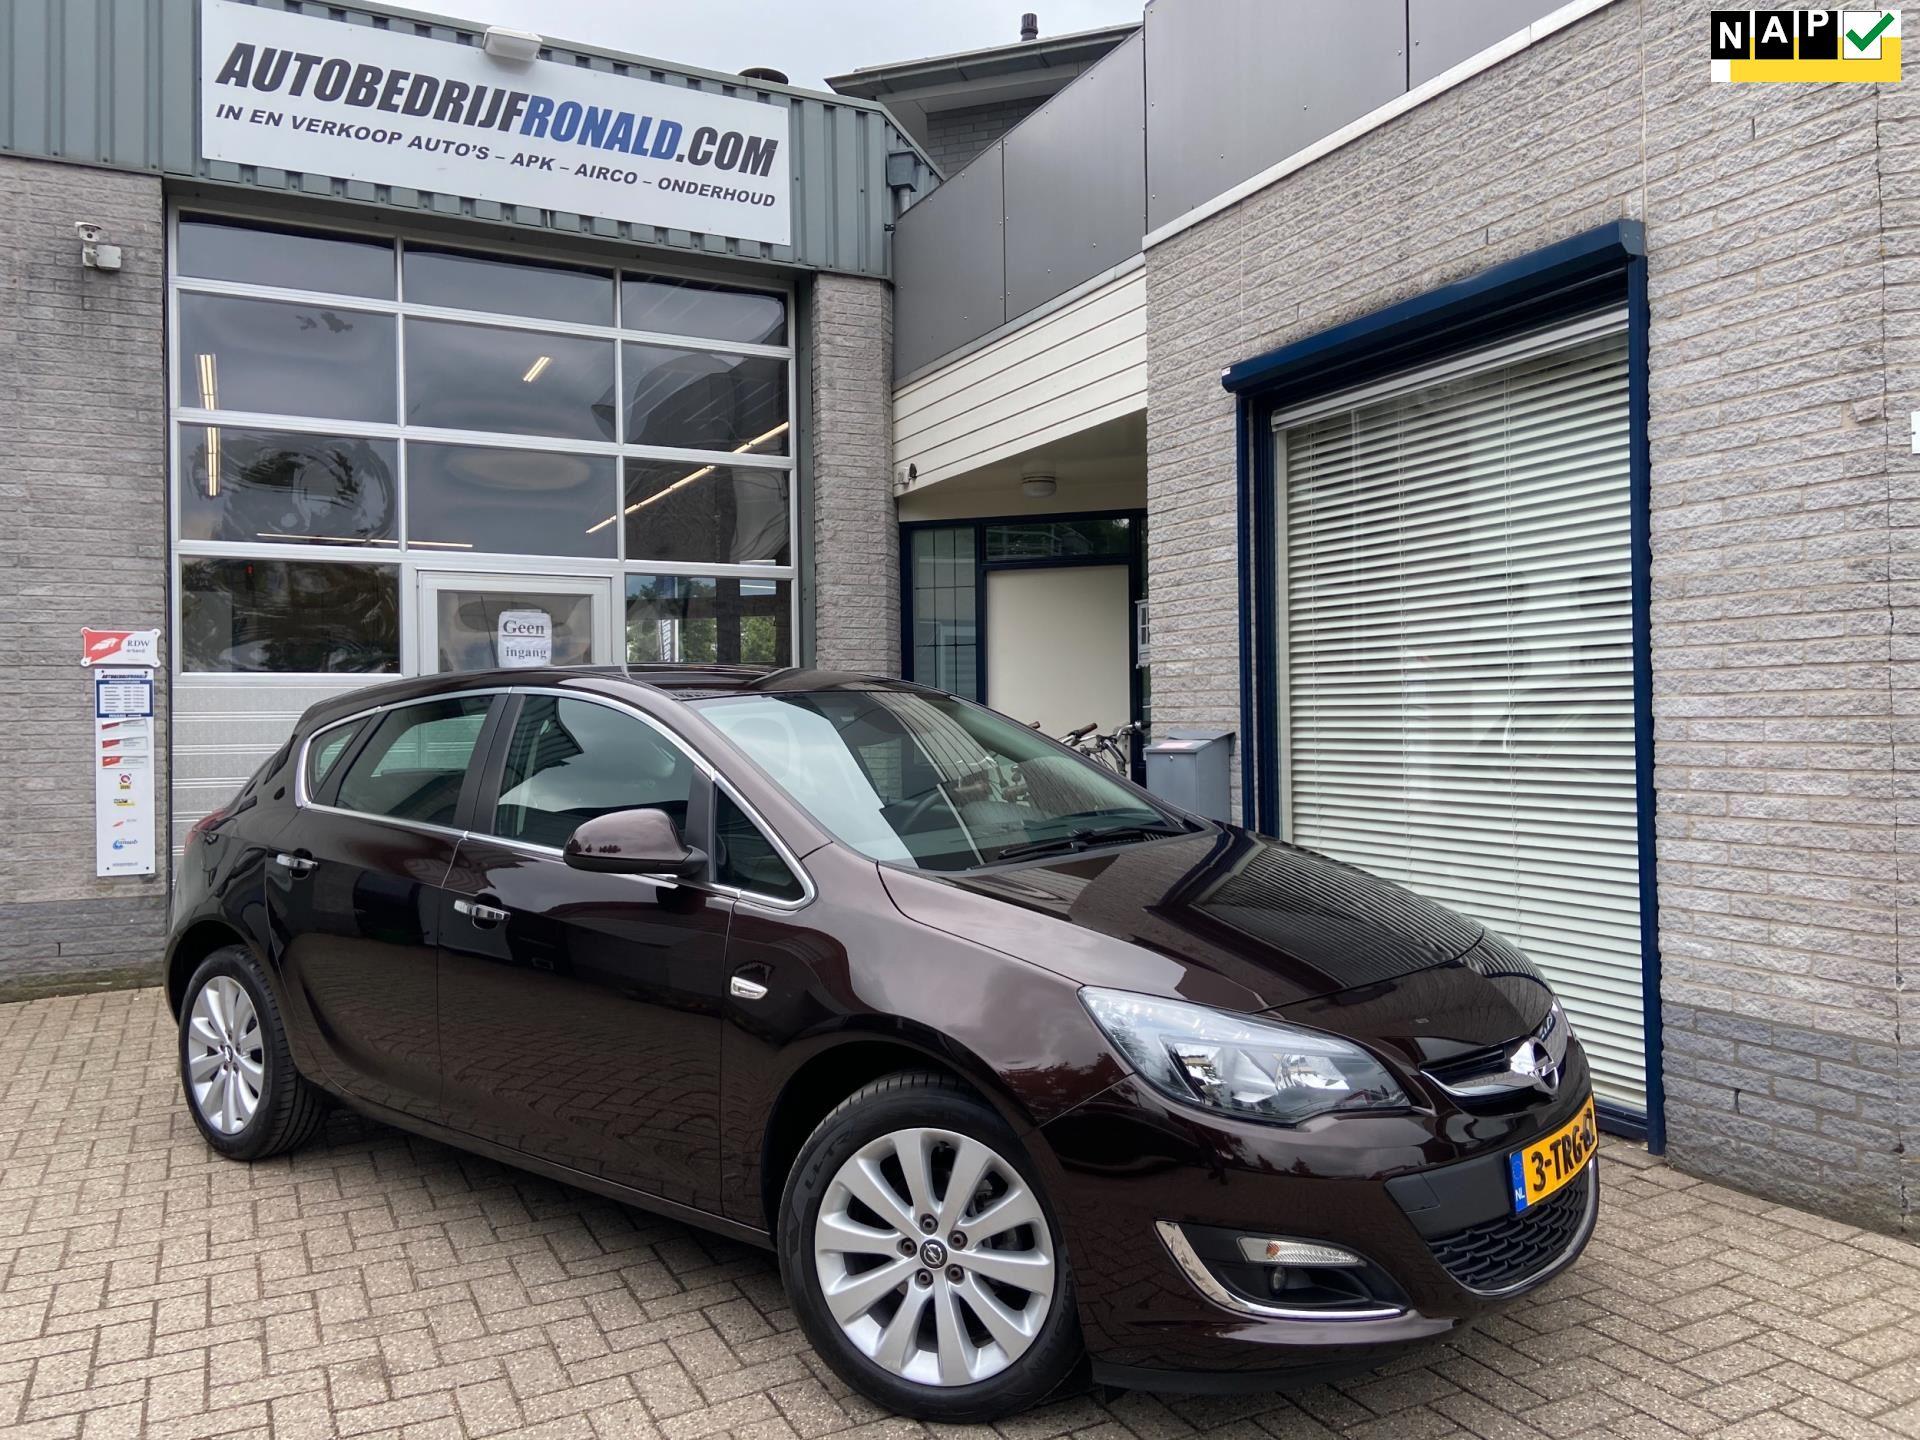 Opel Astra occasion - Autobedrijf Ronald